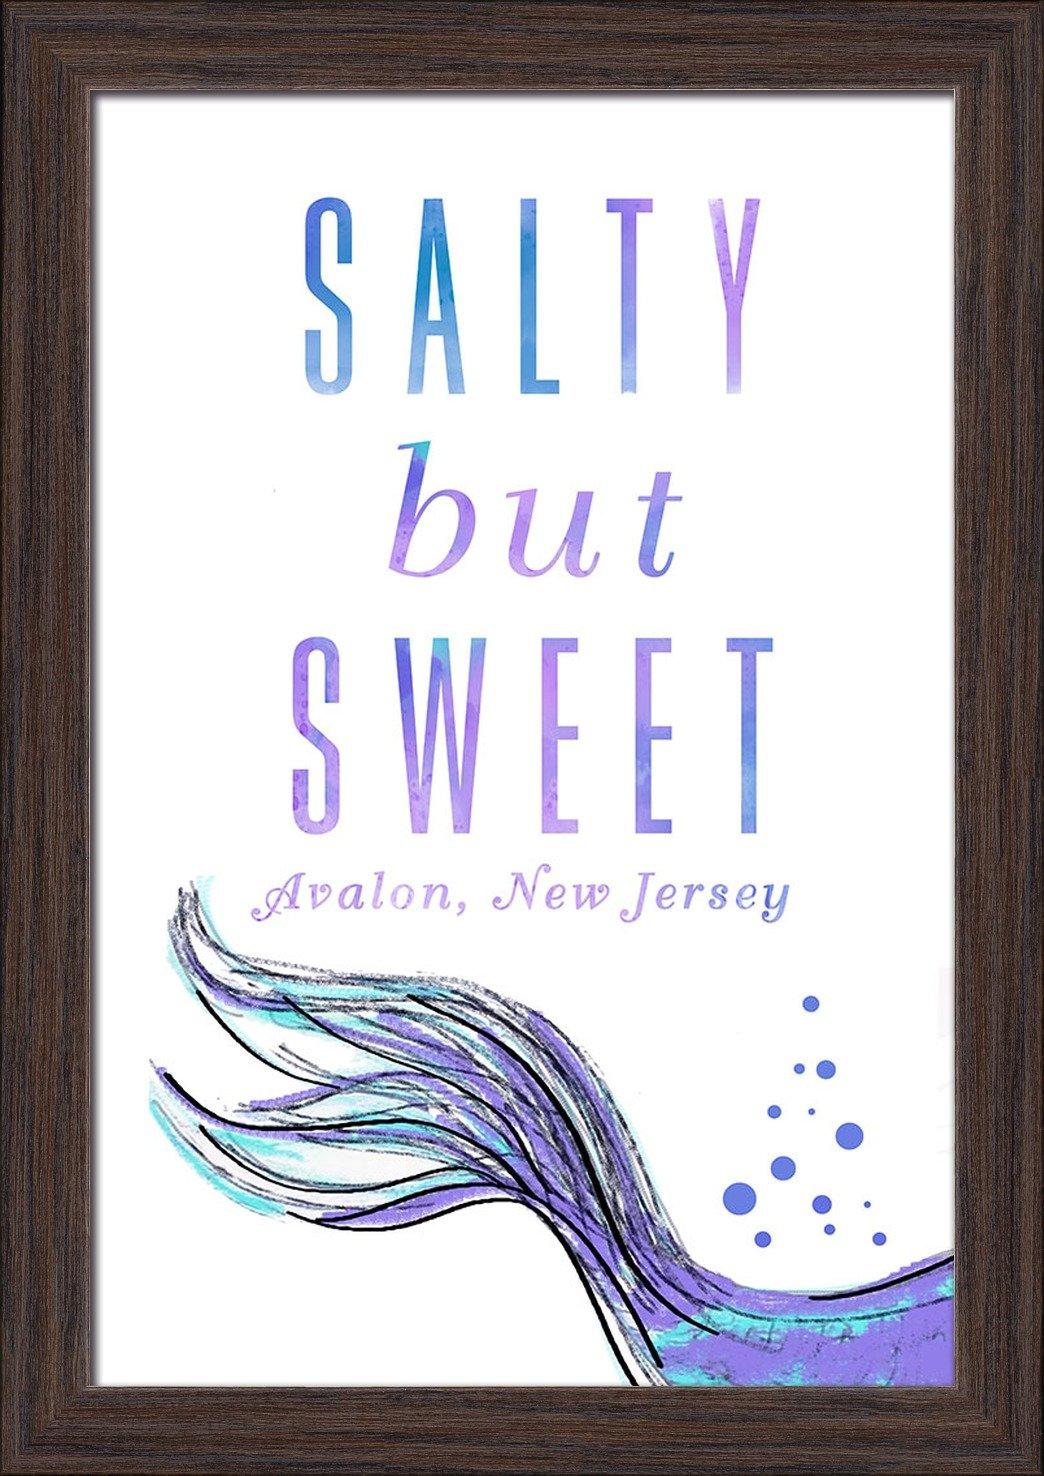 Salty But Sweet 24x36 Giclee Art Print, Gallery Framed, Black Wood Mermaid Tale New Jersey Avalon